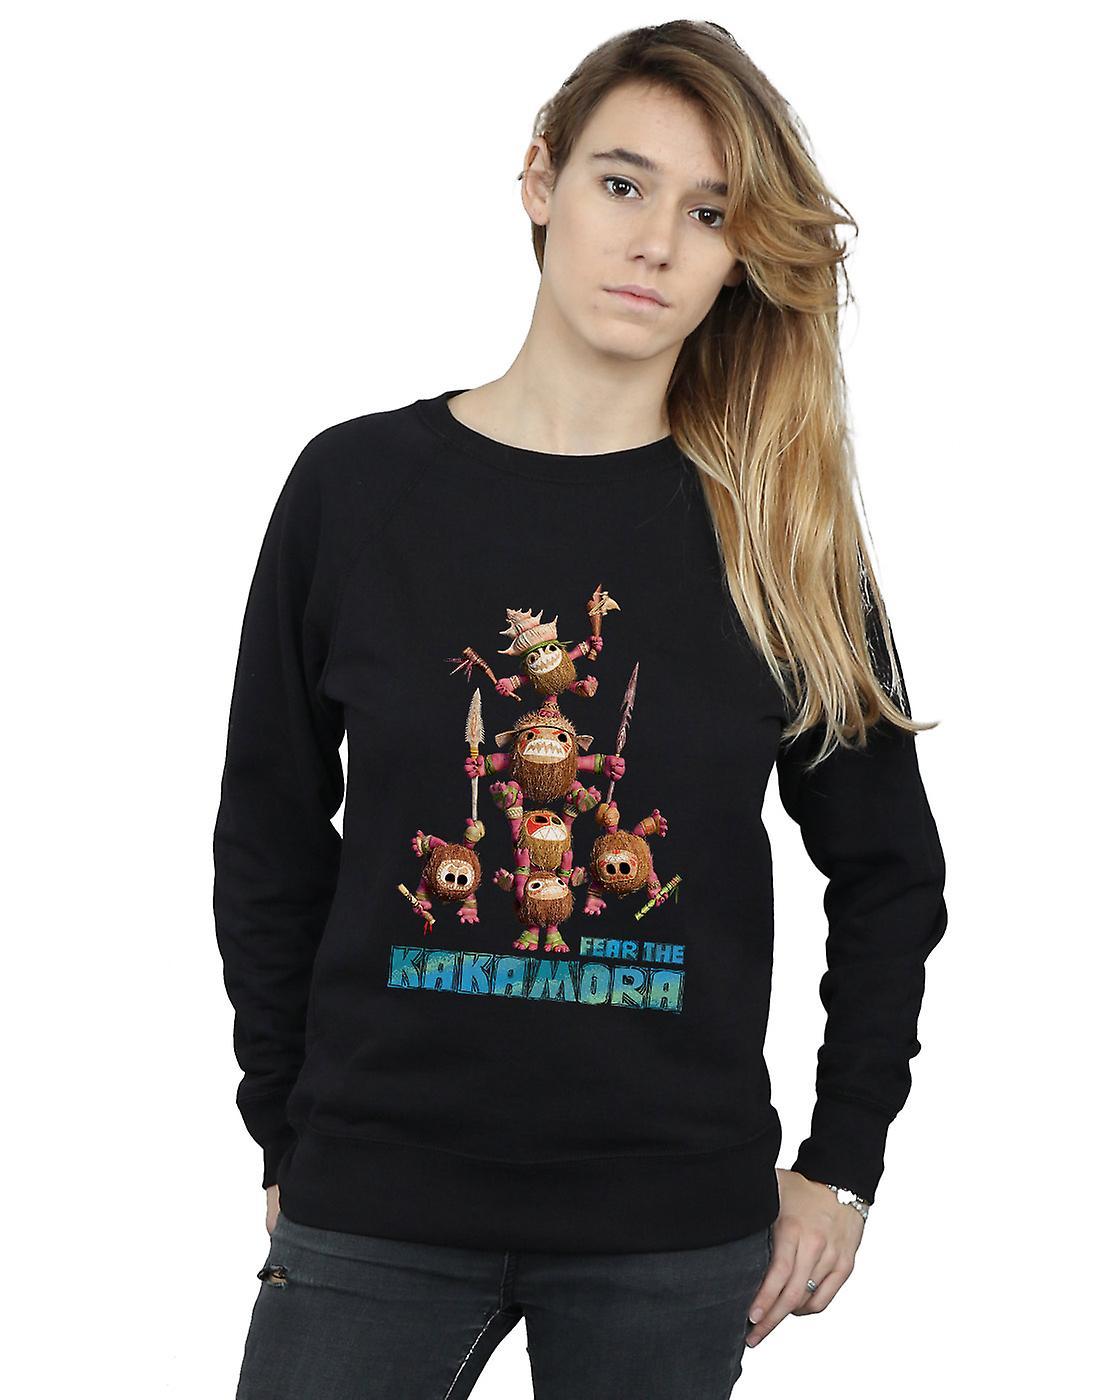 Moana peur Disney féminines le sweat-shirt Kakamora